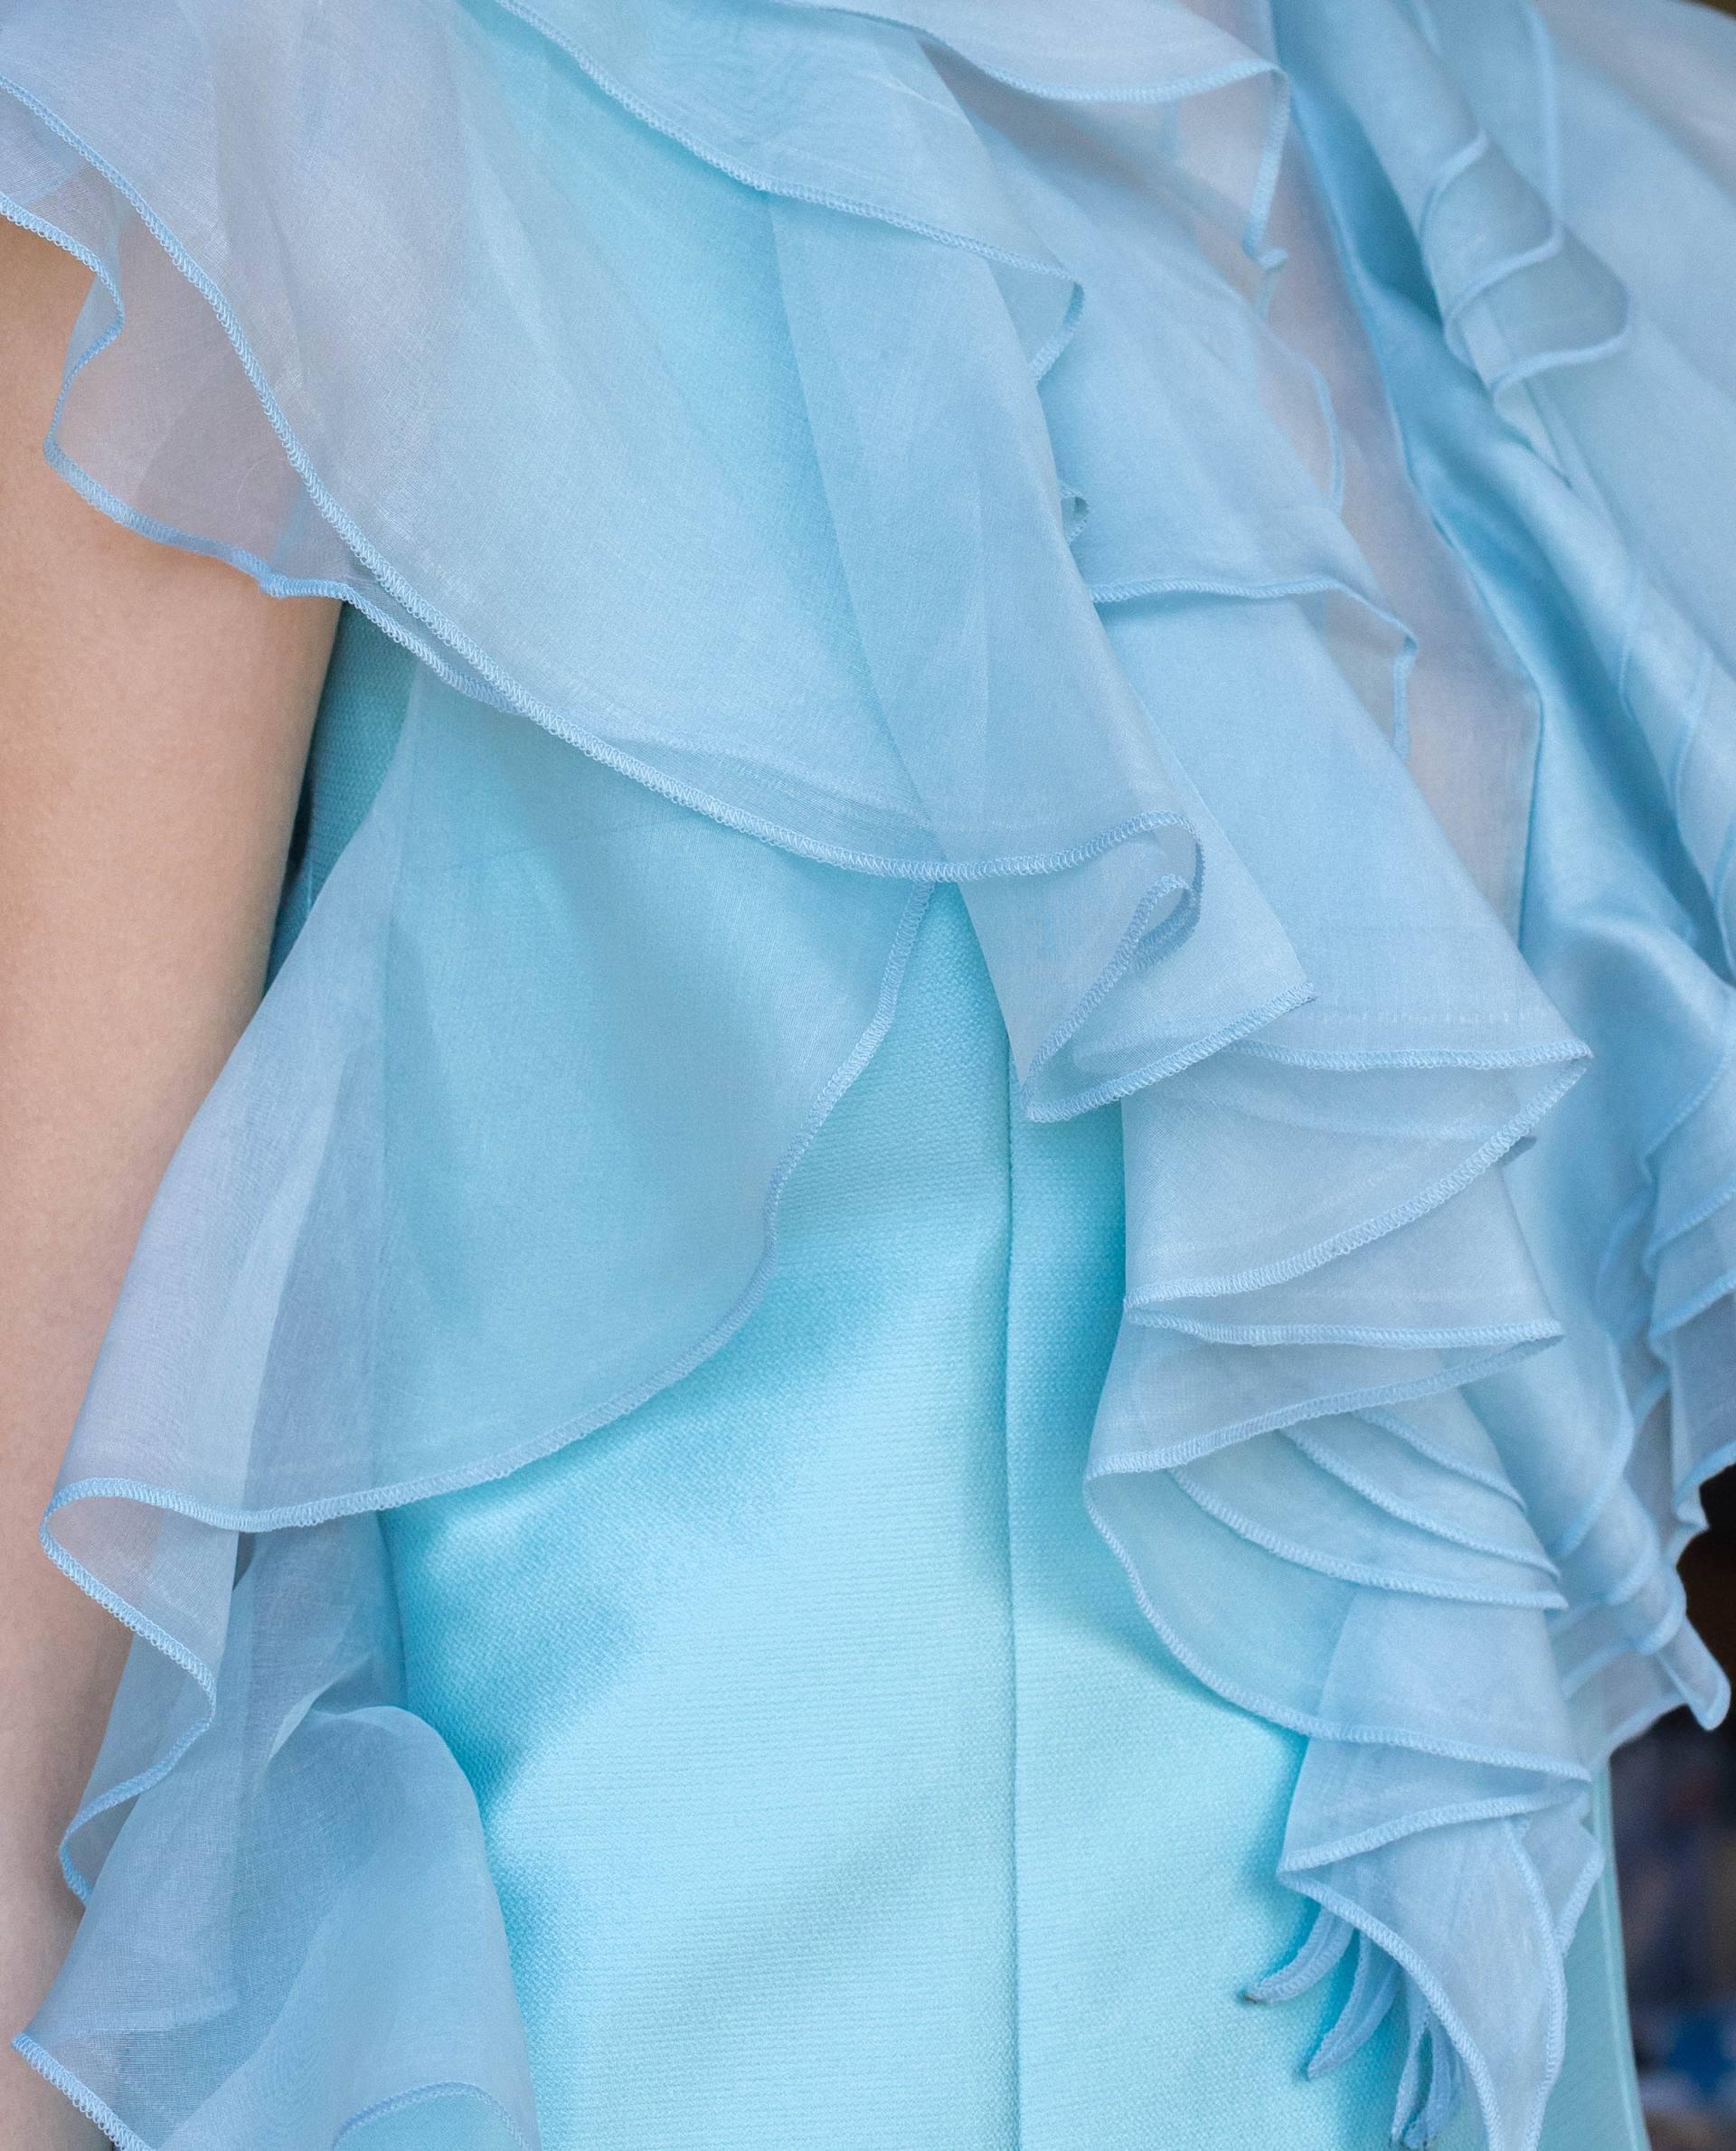 Detalle pechera transparente vestido de fiesta MIA azul